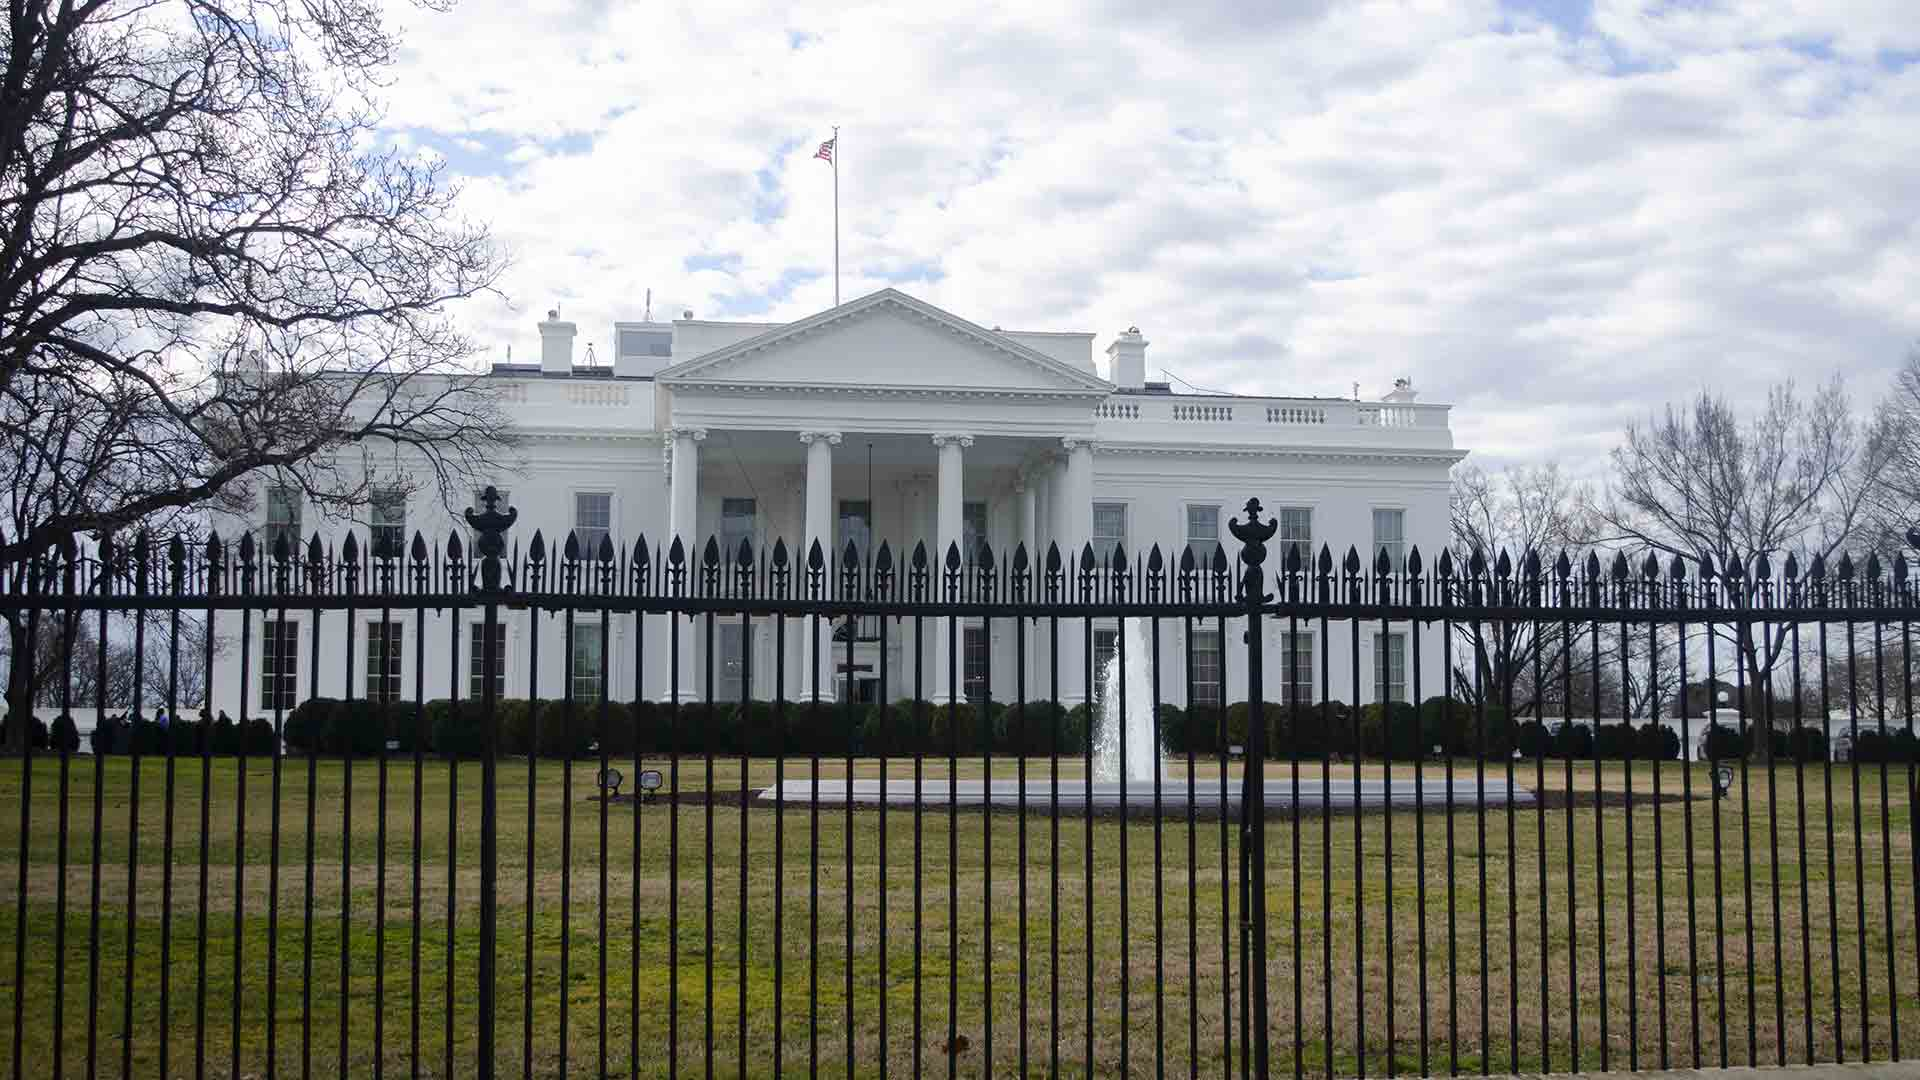 Coronavirus Briefings At The White House